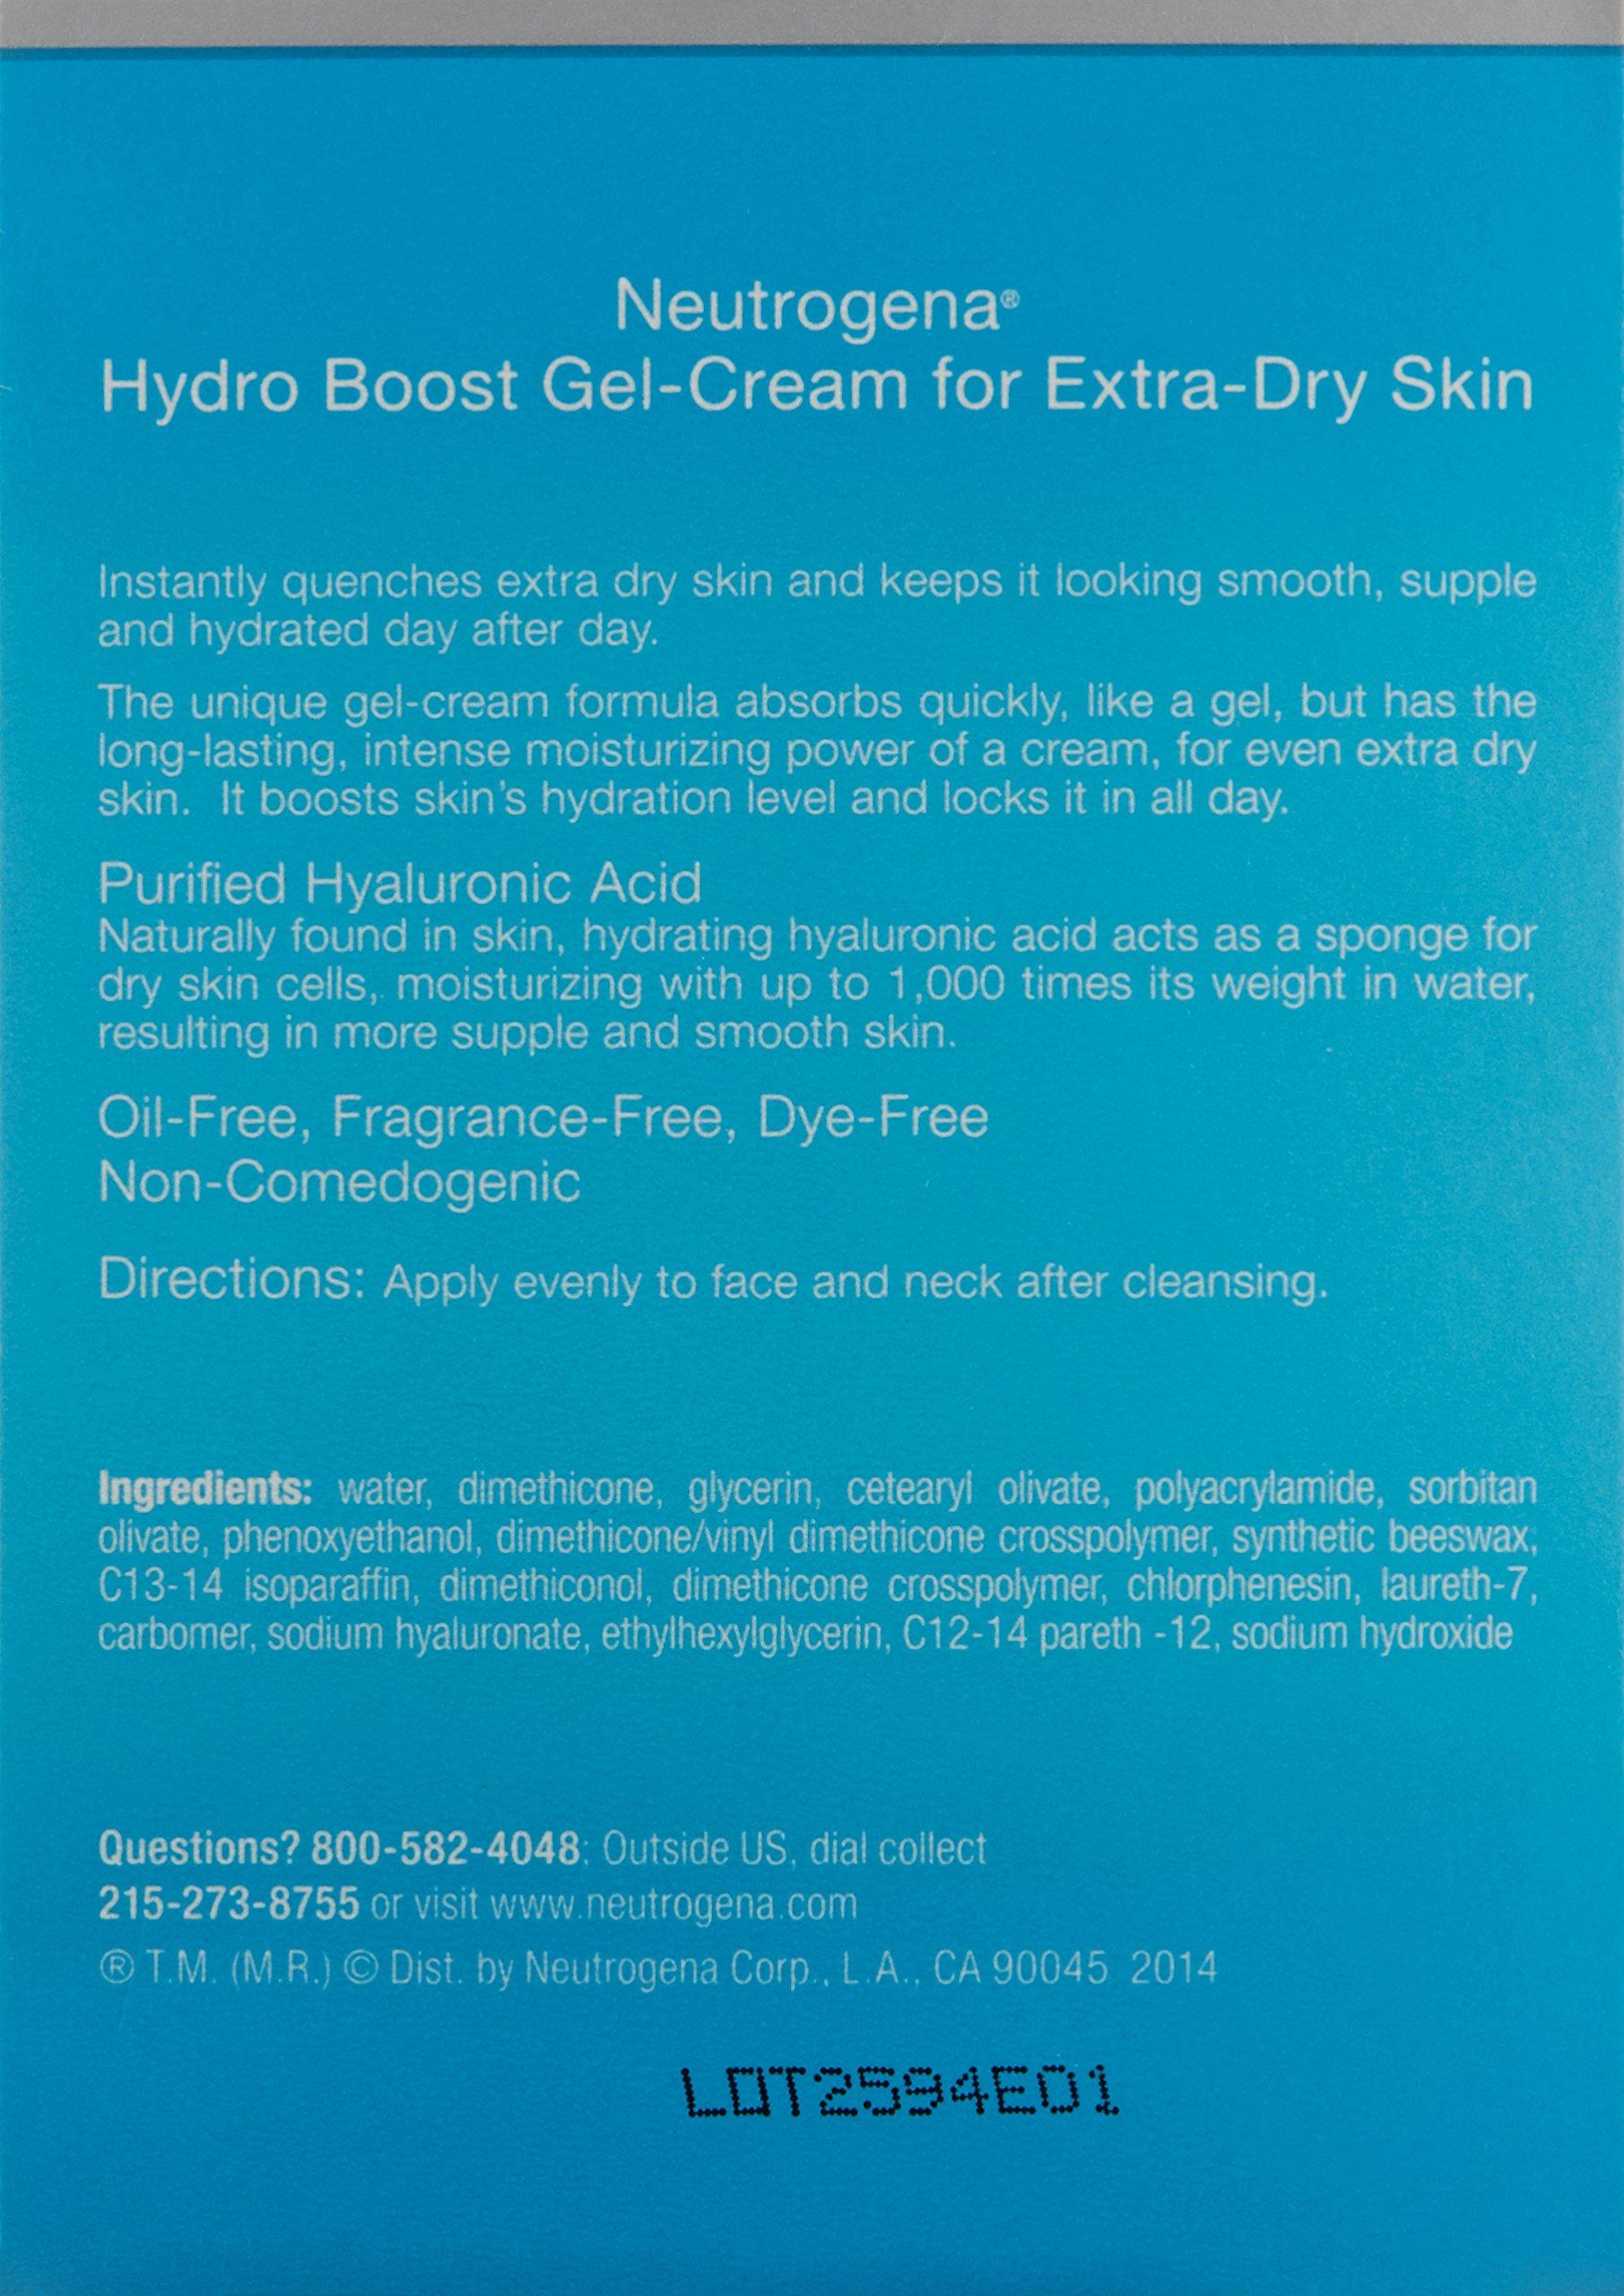 Neutrogena Hydro Boost Hyaluronic Acid Hydrating Face Moisturizer Gel-Cream to Hydrate and Smooth Extra-Dry Skin, 1.7 oz by Neutrogena (Image #2)